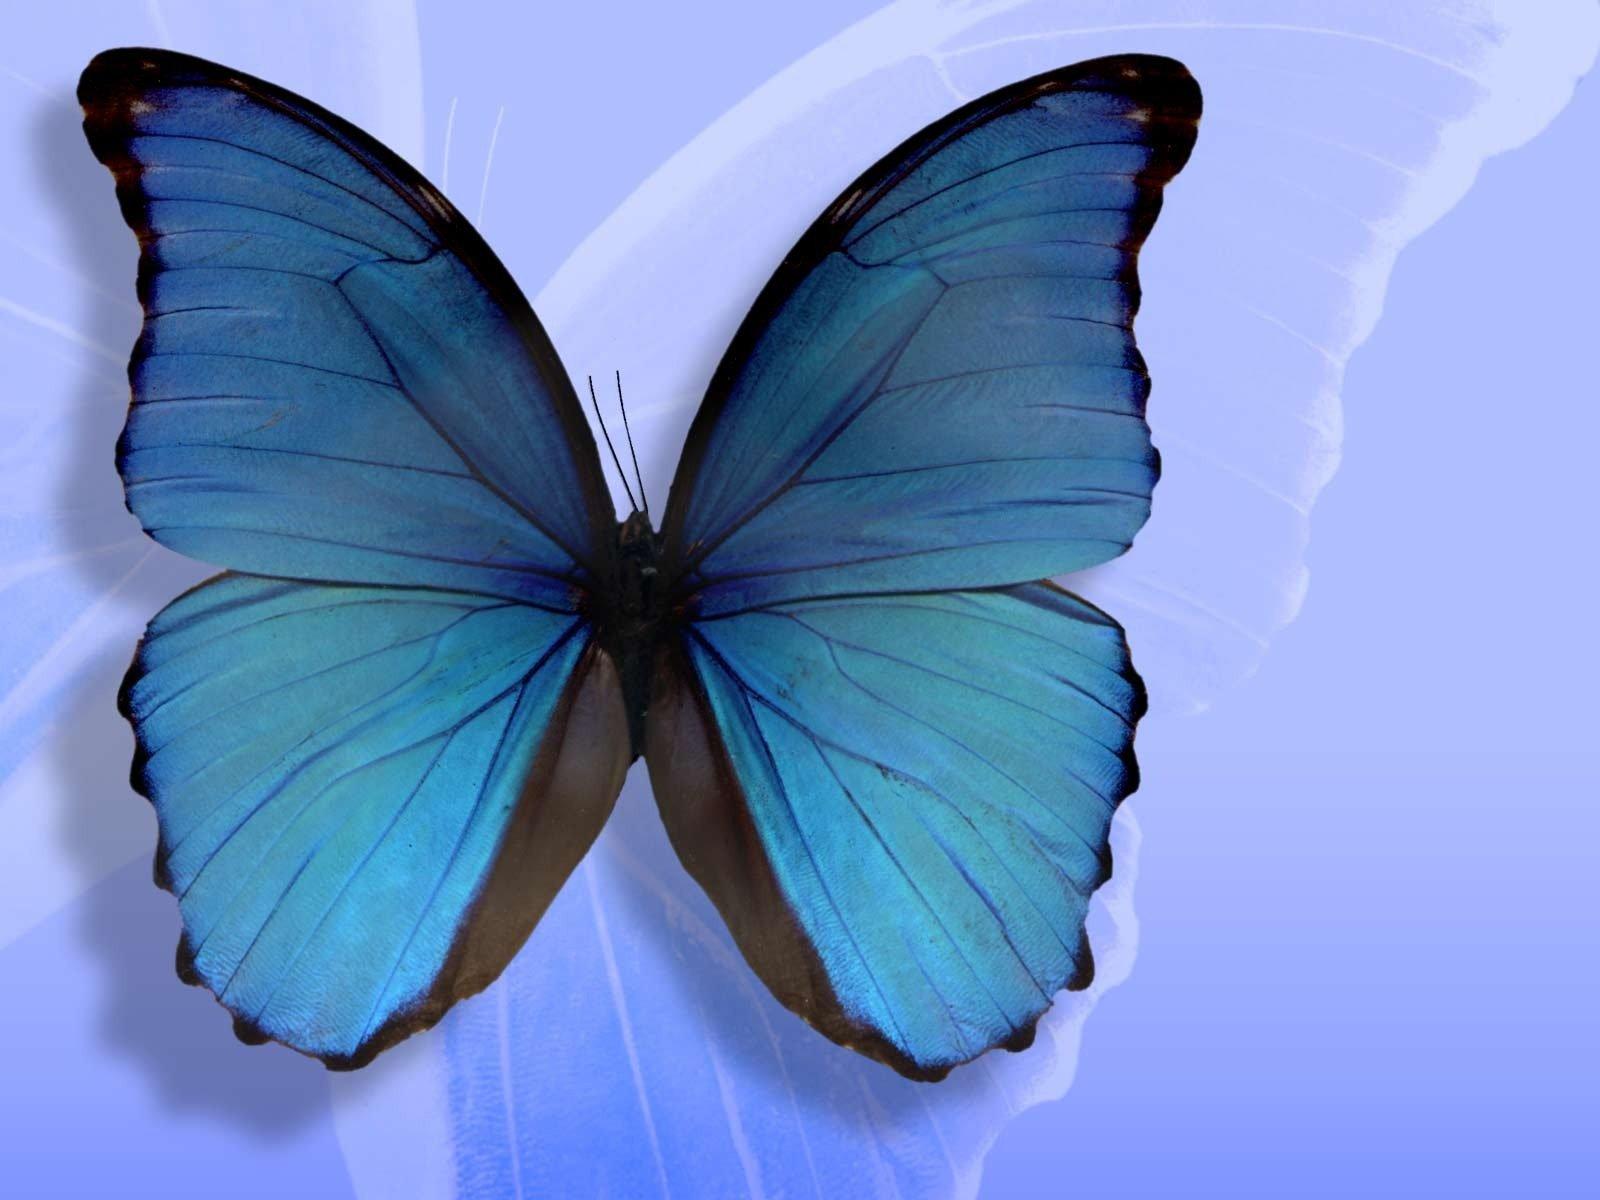 HD Butterfly Wallpapers For Desktop High Definition WallpapersCool 1600x1200